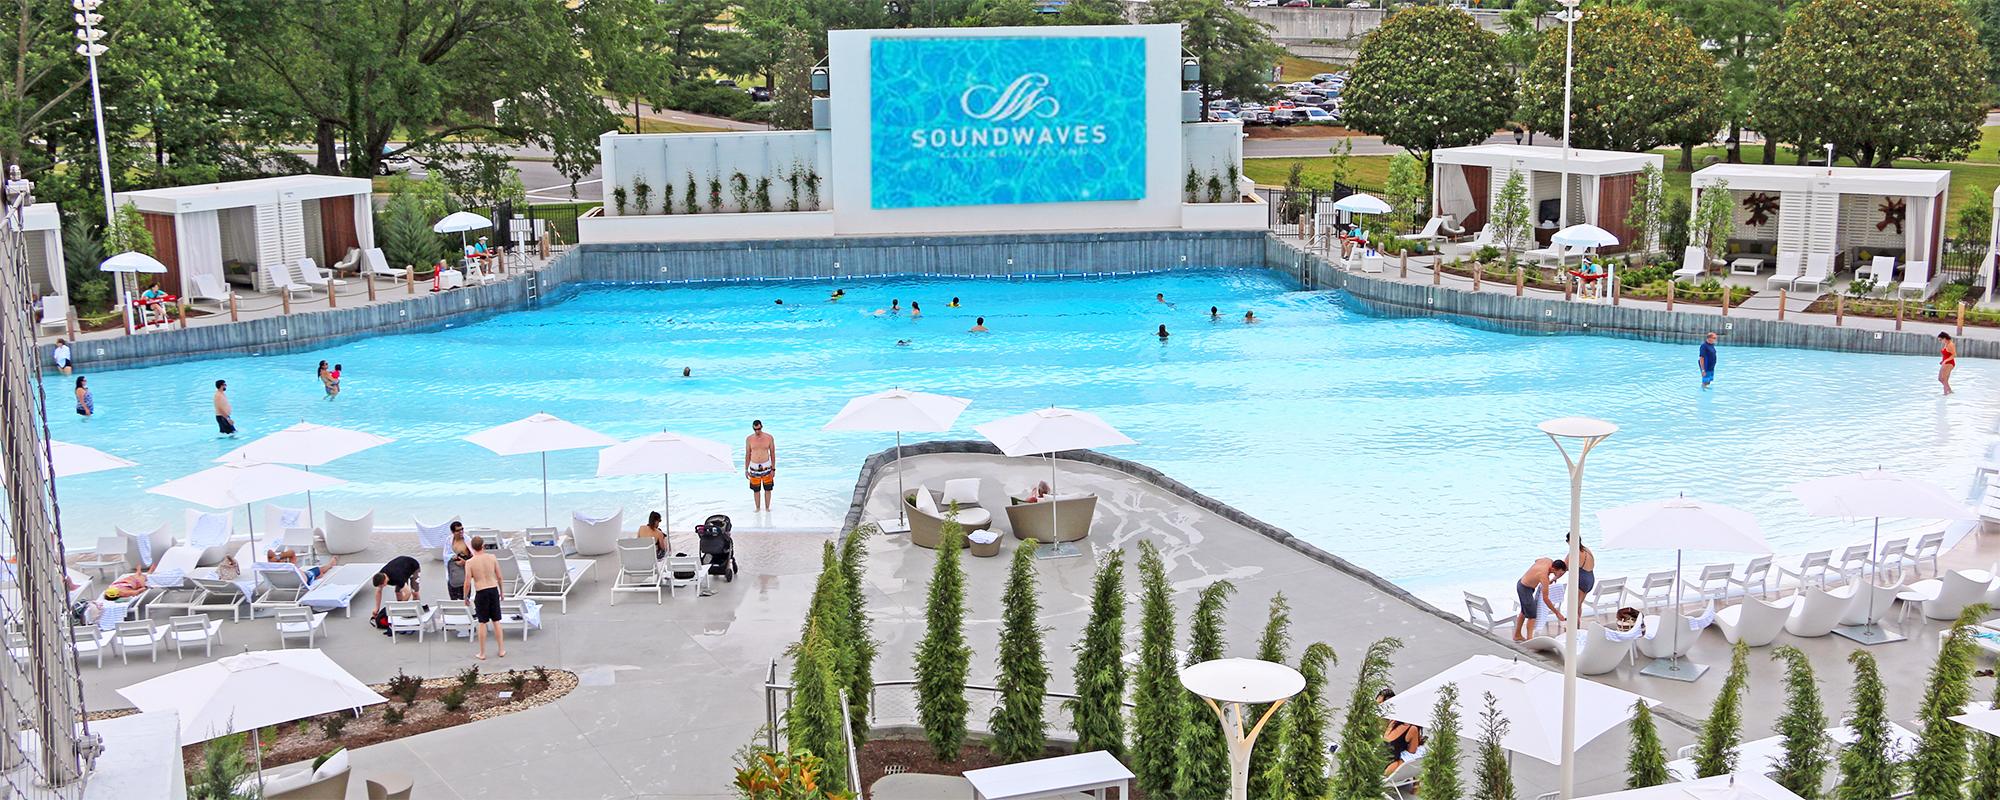 resort wave pool at opryland